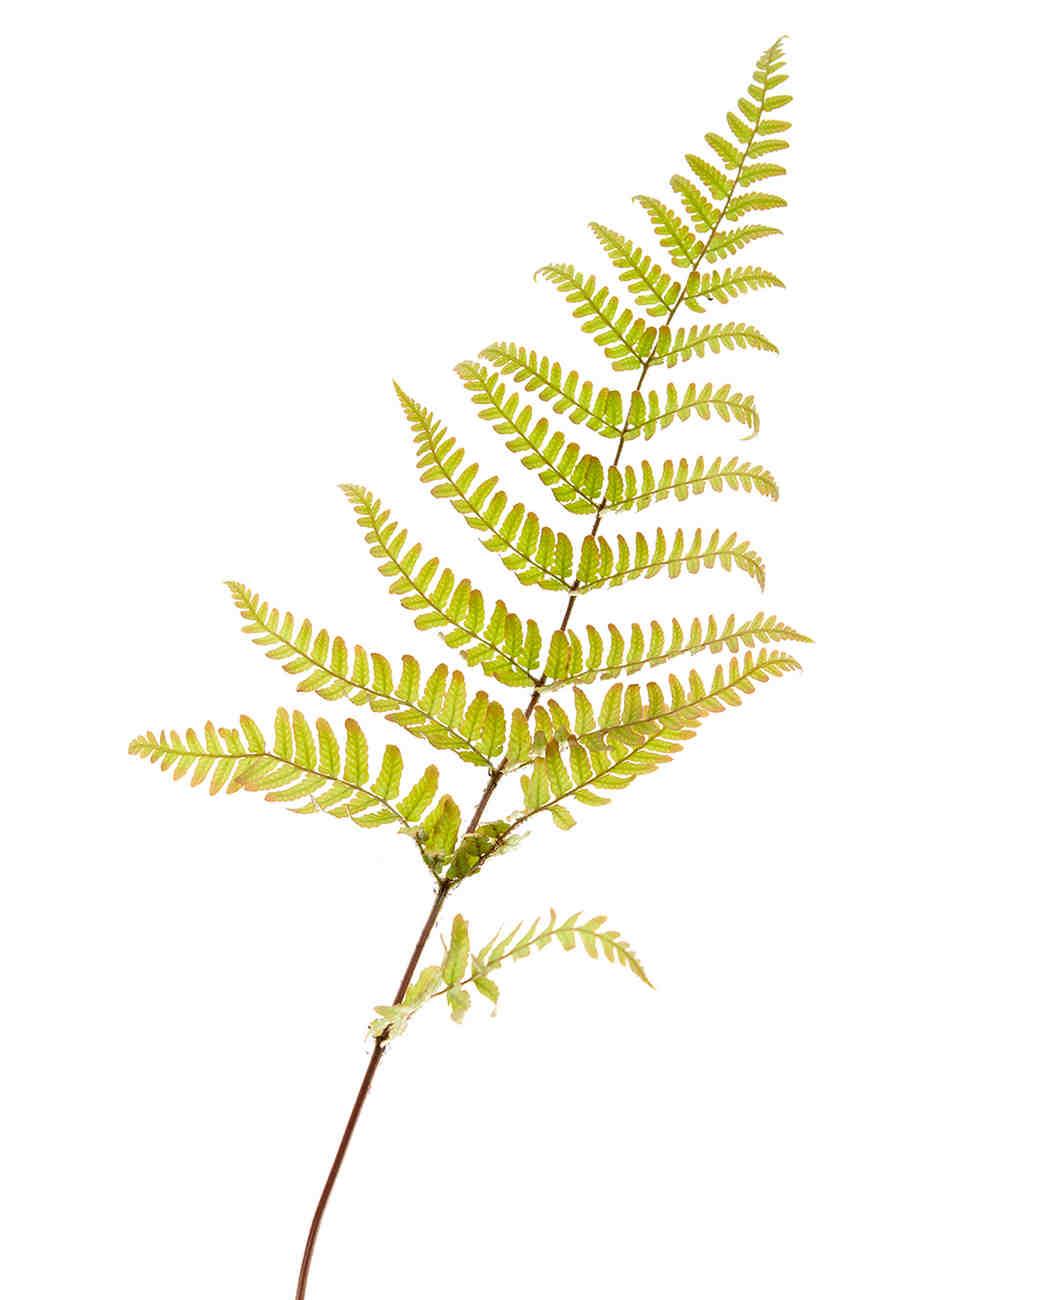 flower-glossary-fern-frillance-aut-0415.jpg